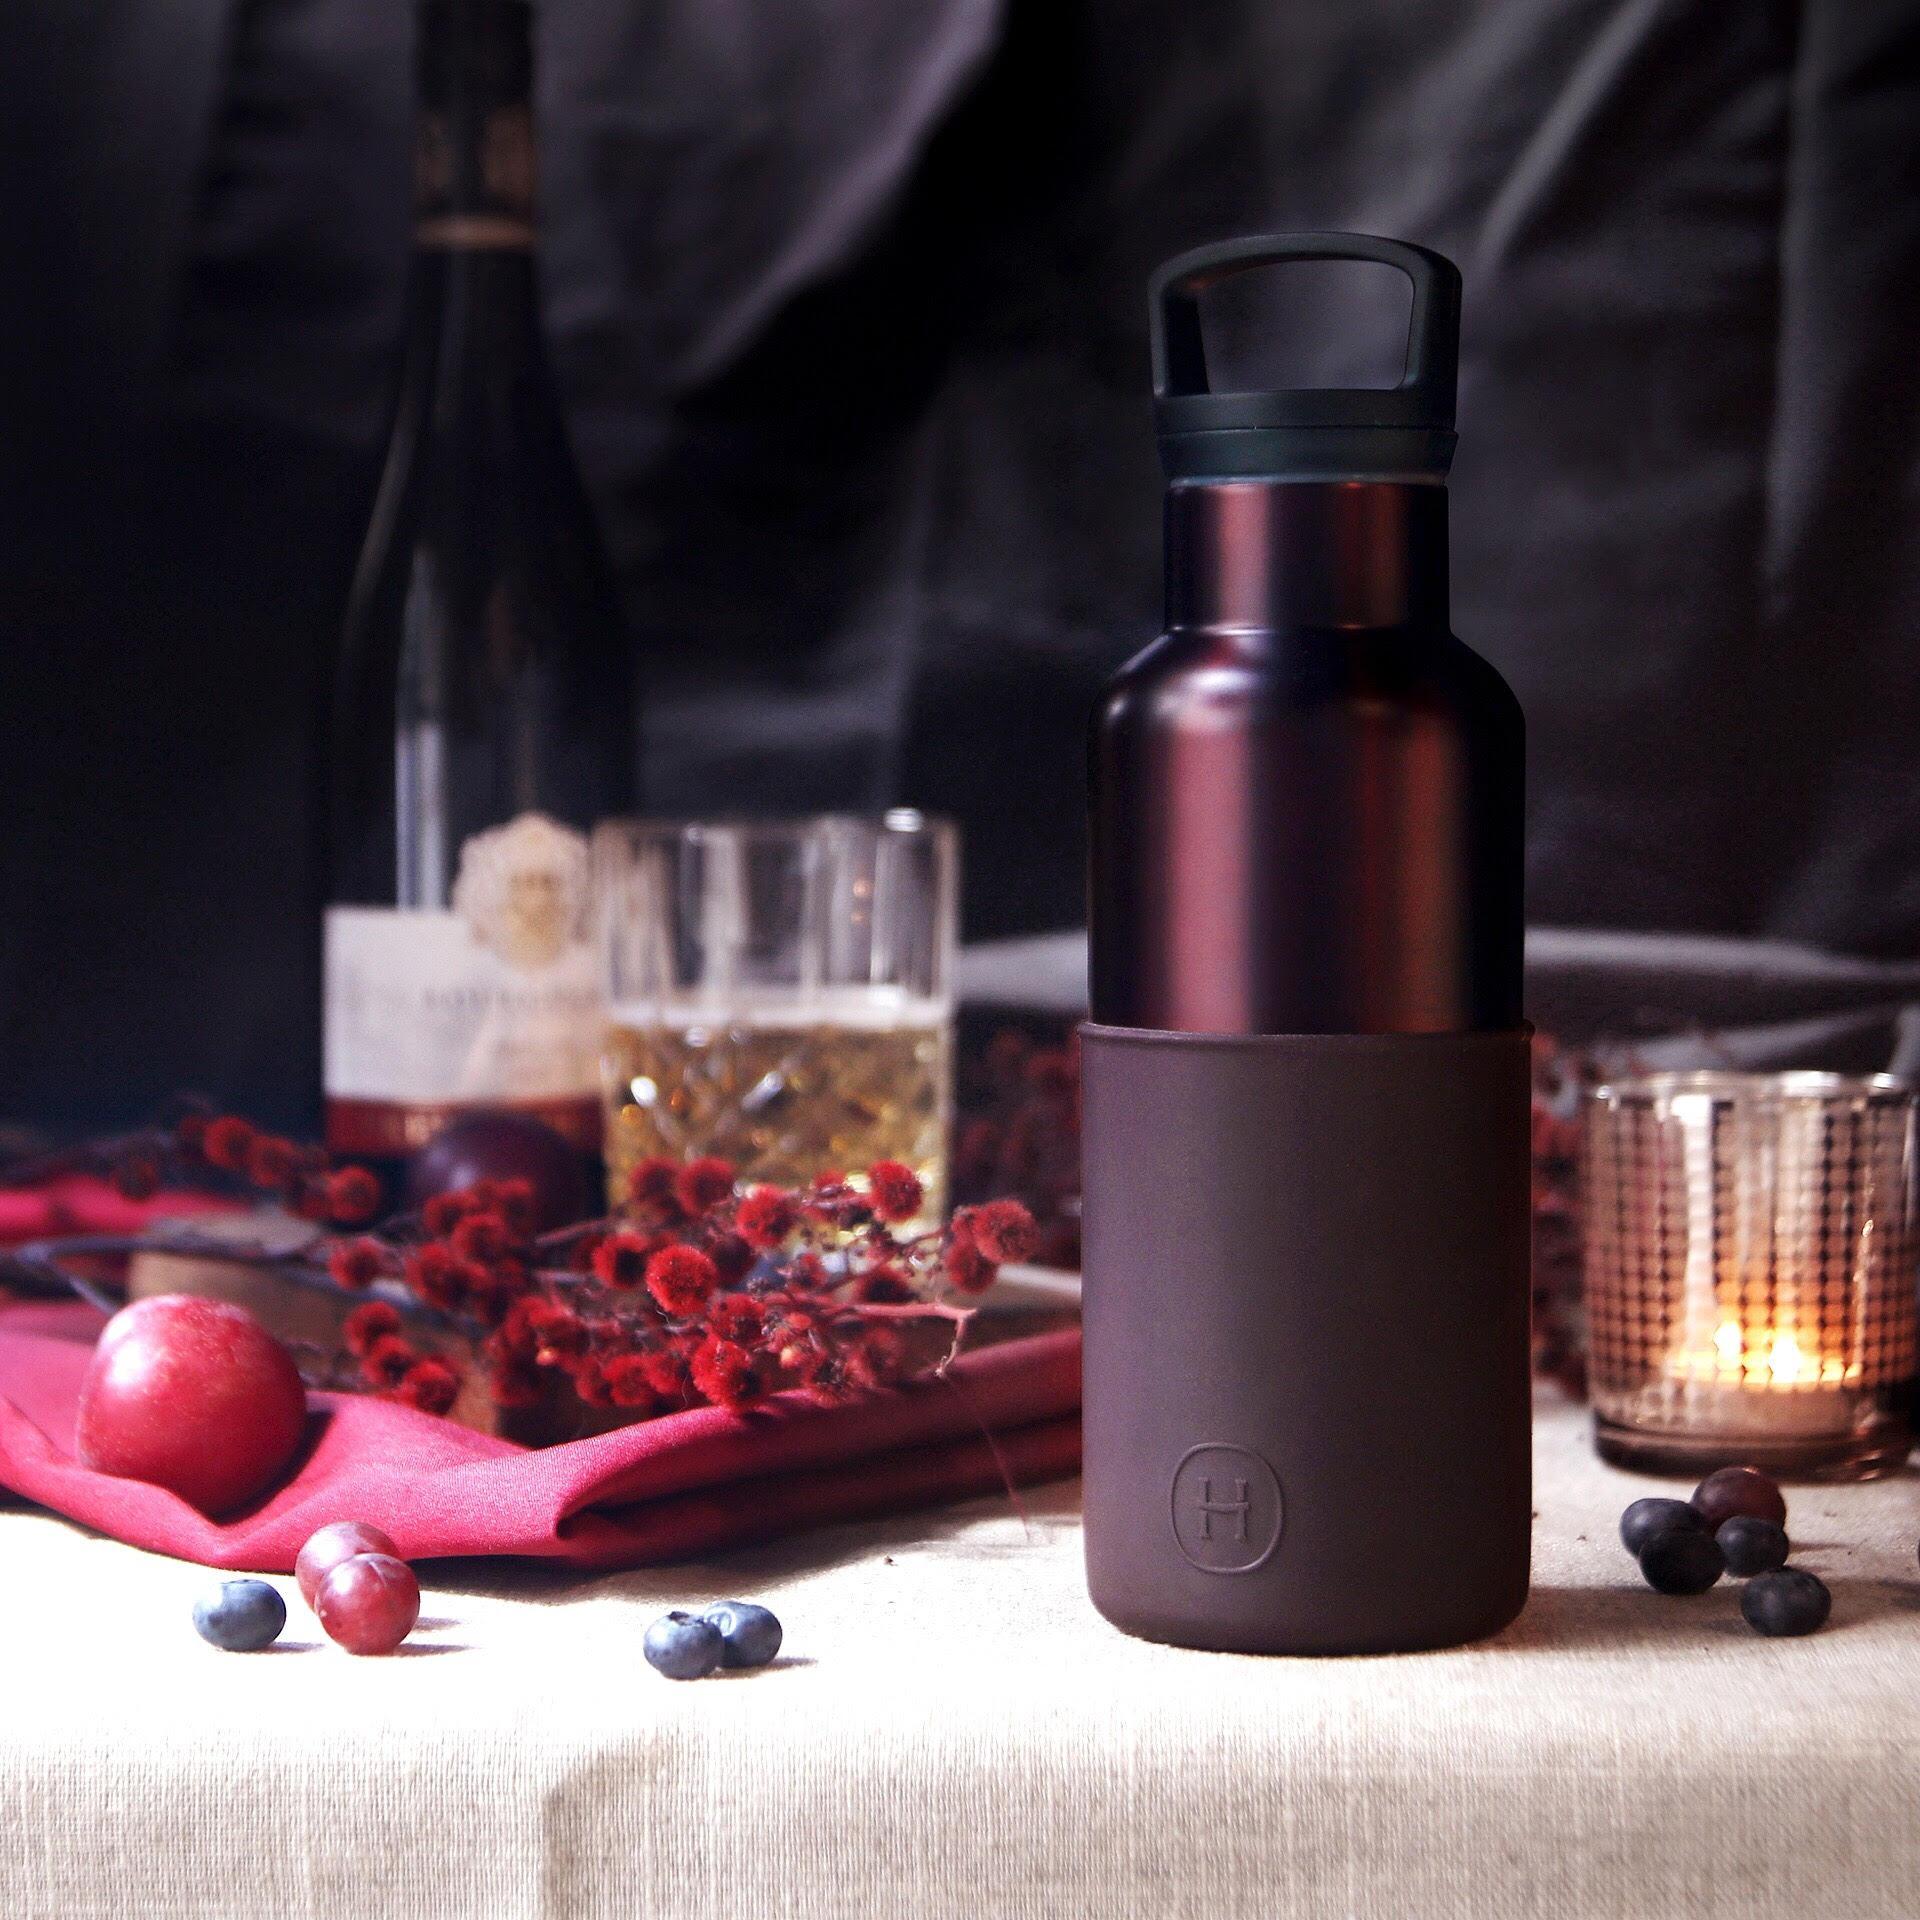 hydy smaller bottle.jpg